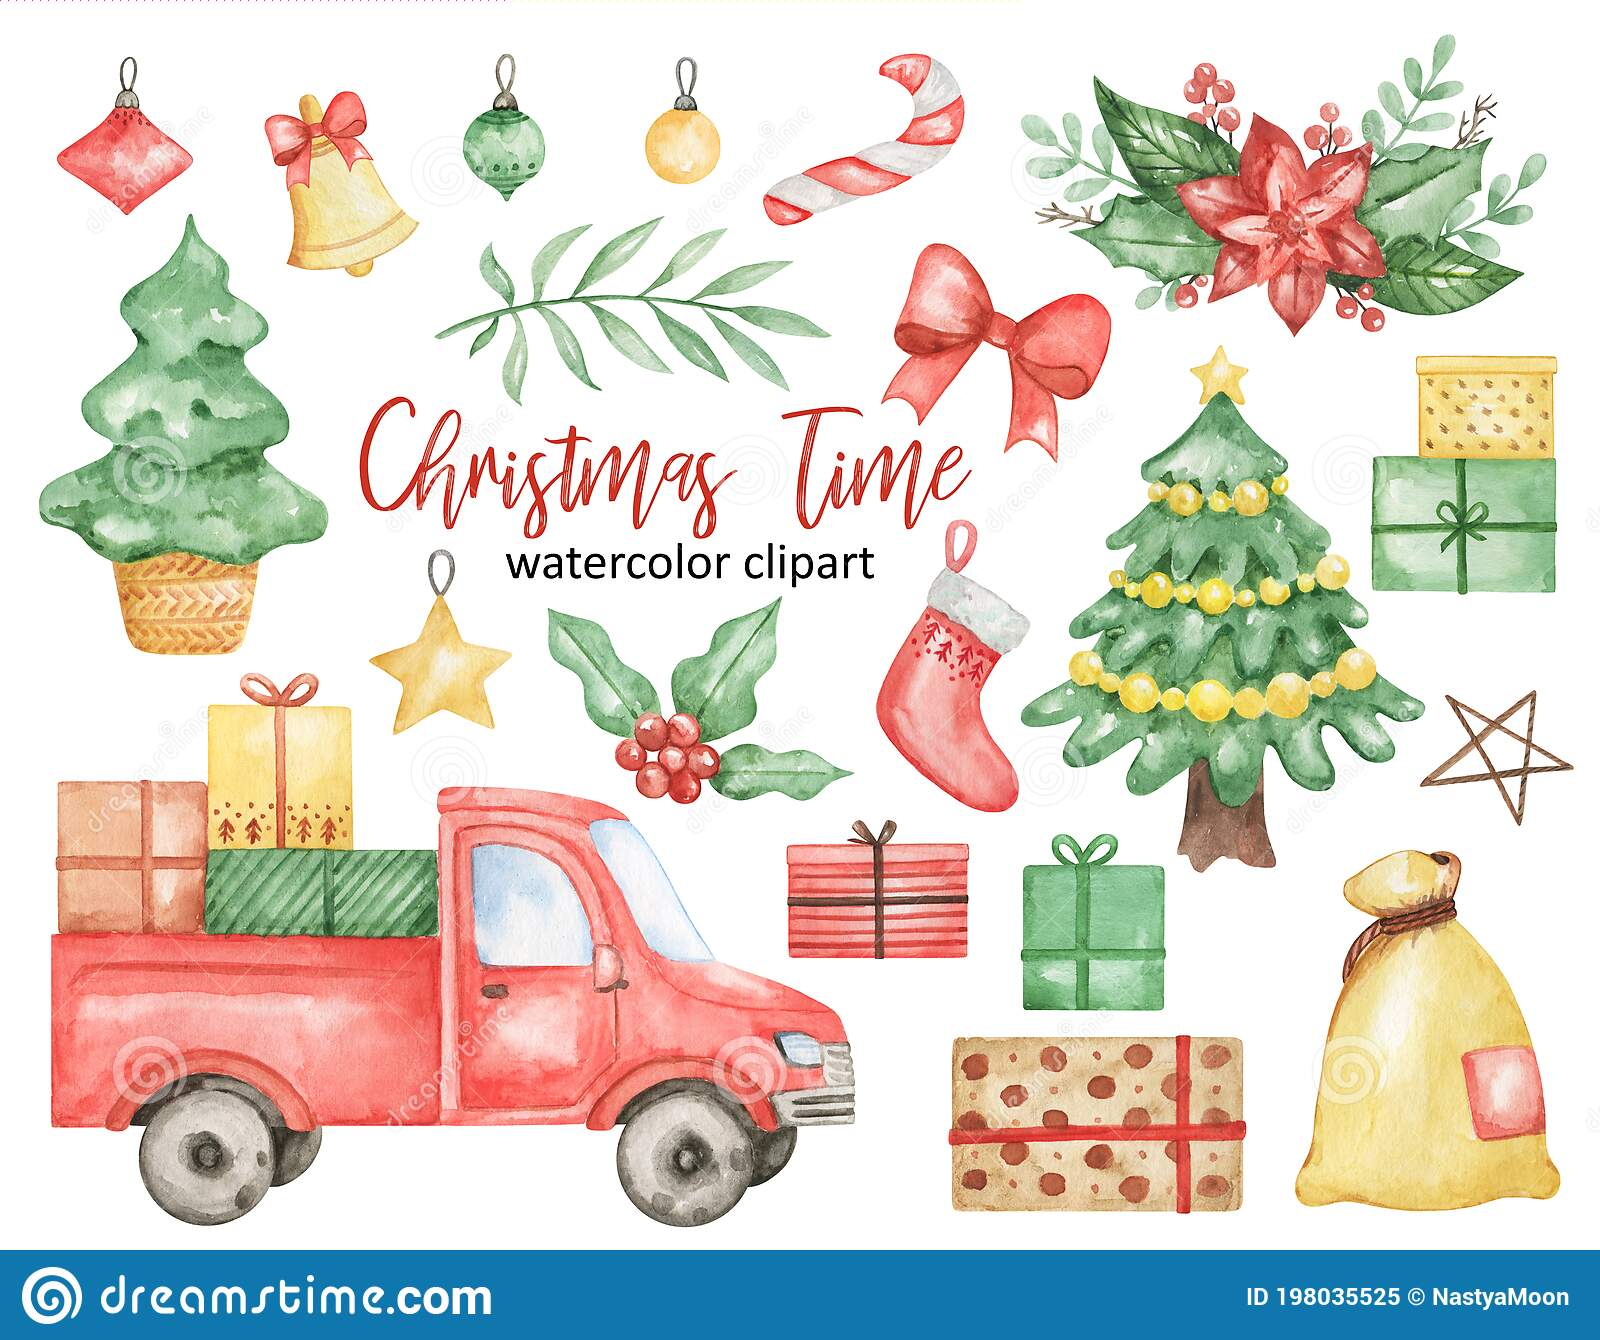 Watercolor Christmas Clipart Graphics Winter Holiday Leaves | Etsy |  Christmas watercolor, Christmas clipart, Clip art